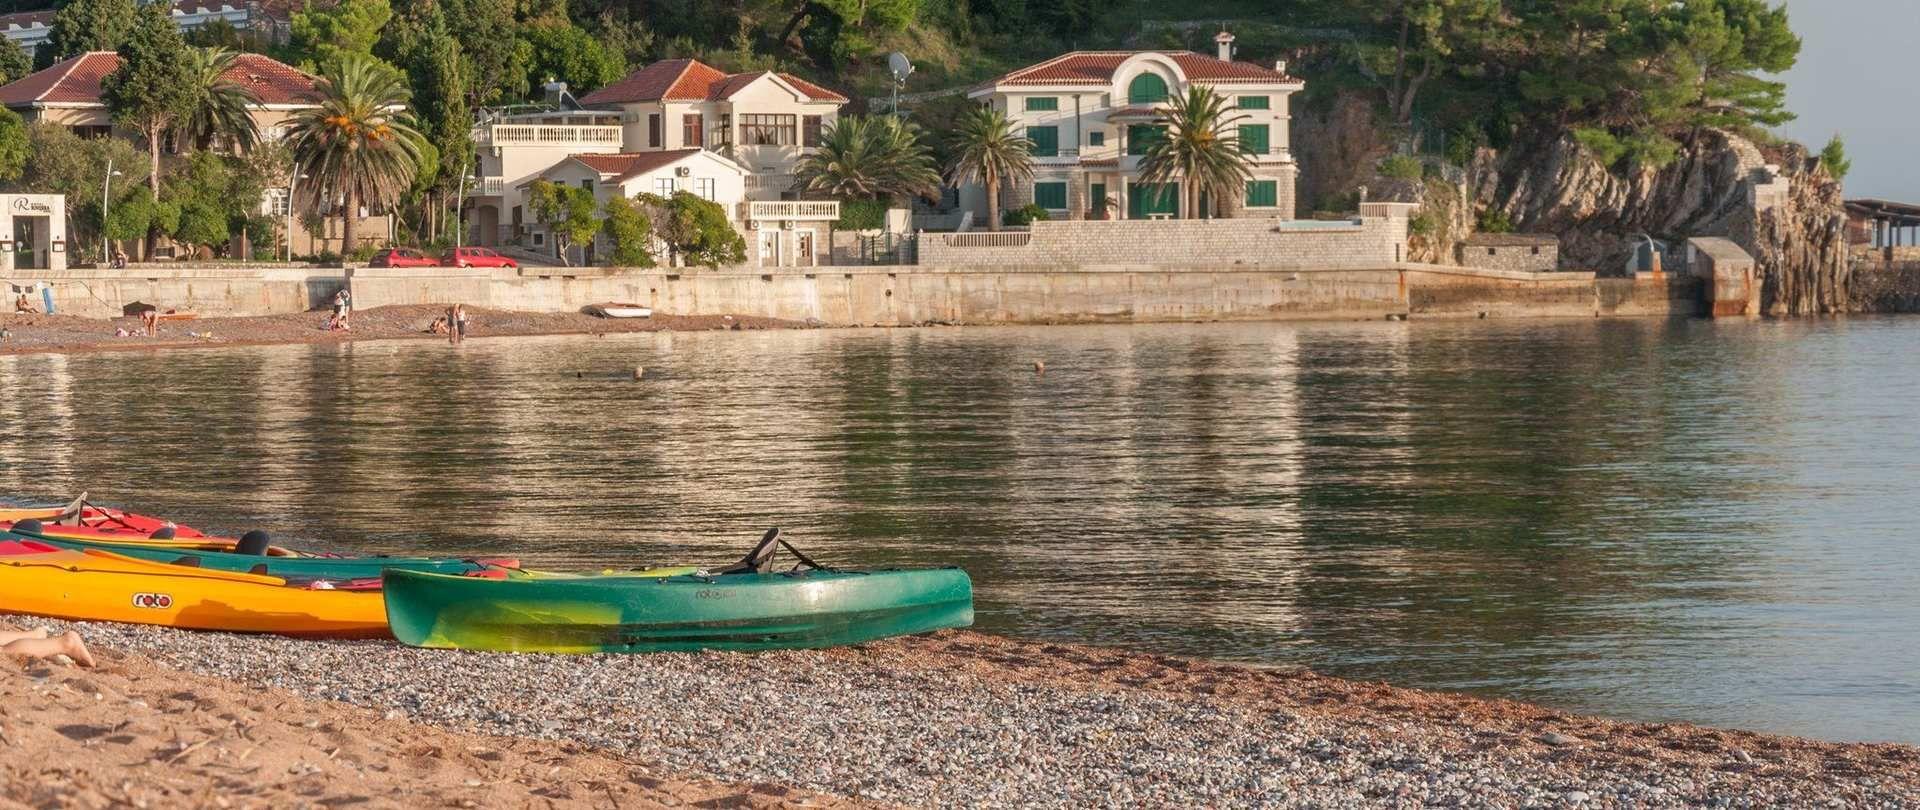 Petrovac, Montenegro #summer #SummerHoliday #Montenegro #travel #mediterranean #Petrovac